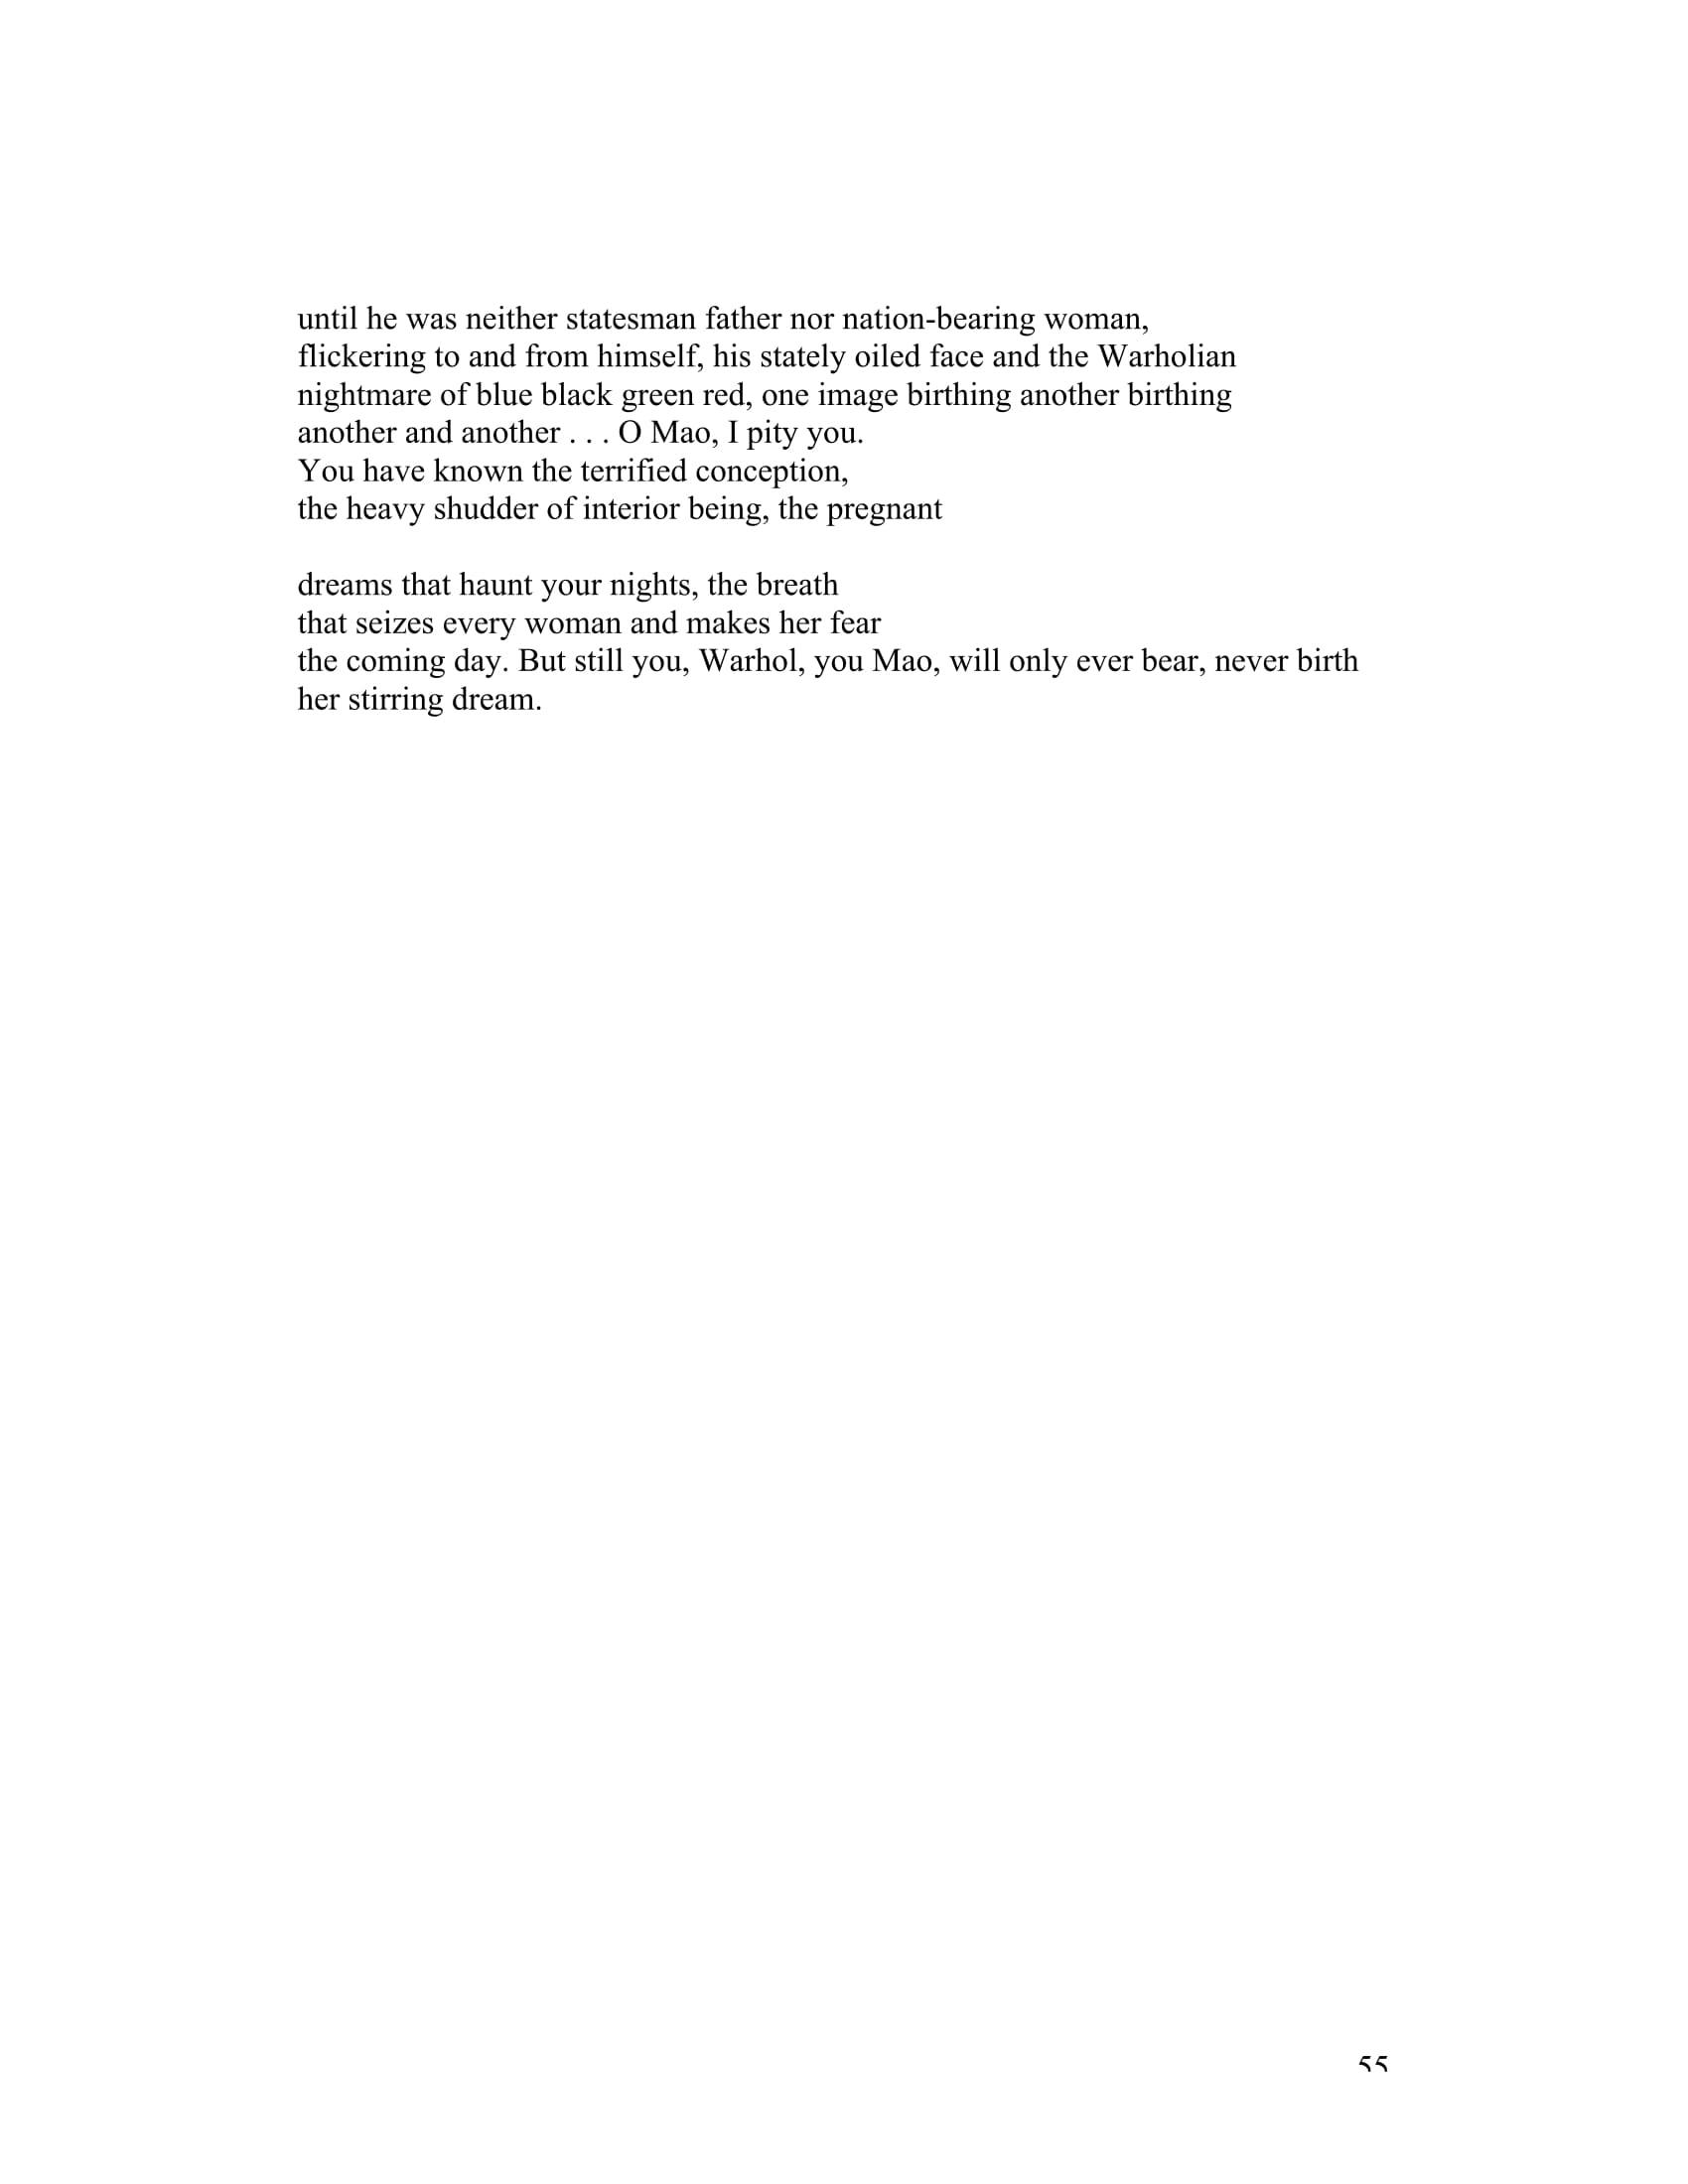 2017.10.31 UNWINDING PAGE-55.jpg